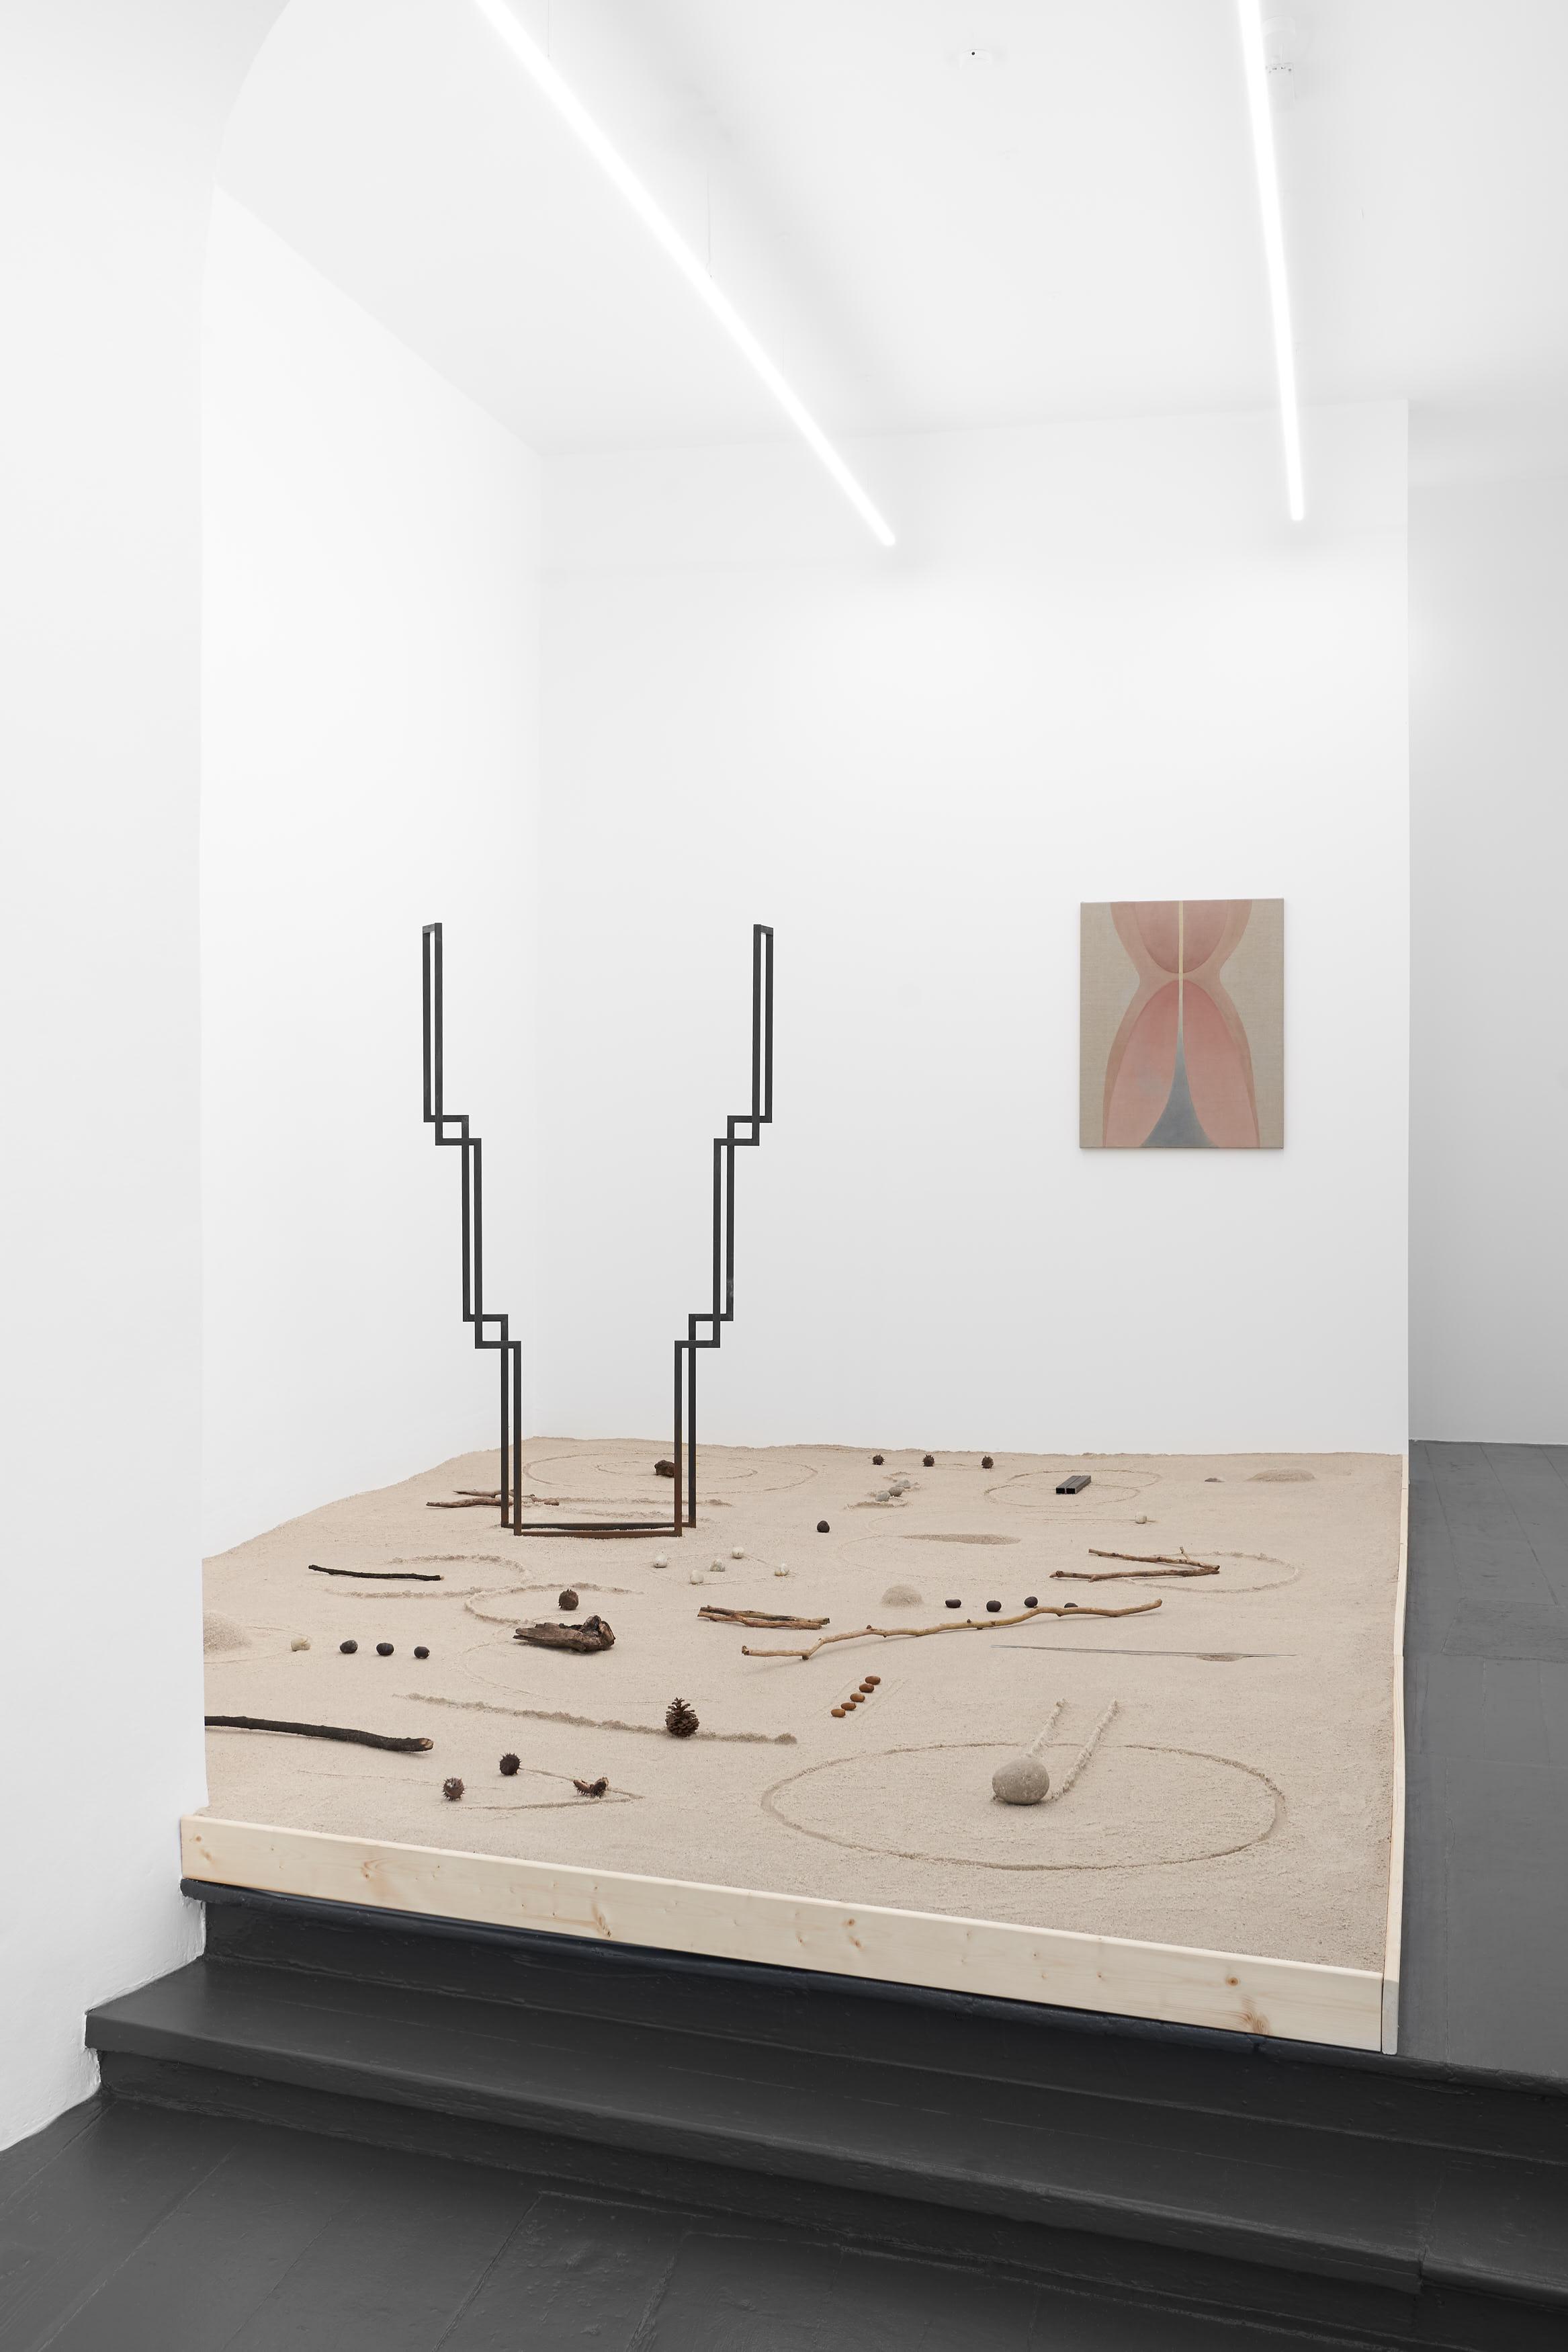 Rachel Garrard - Metamorphosis of the First Form, 2021